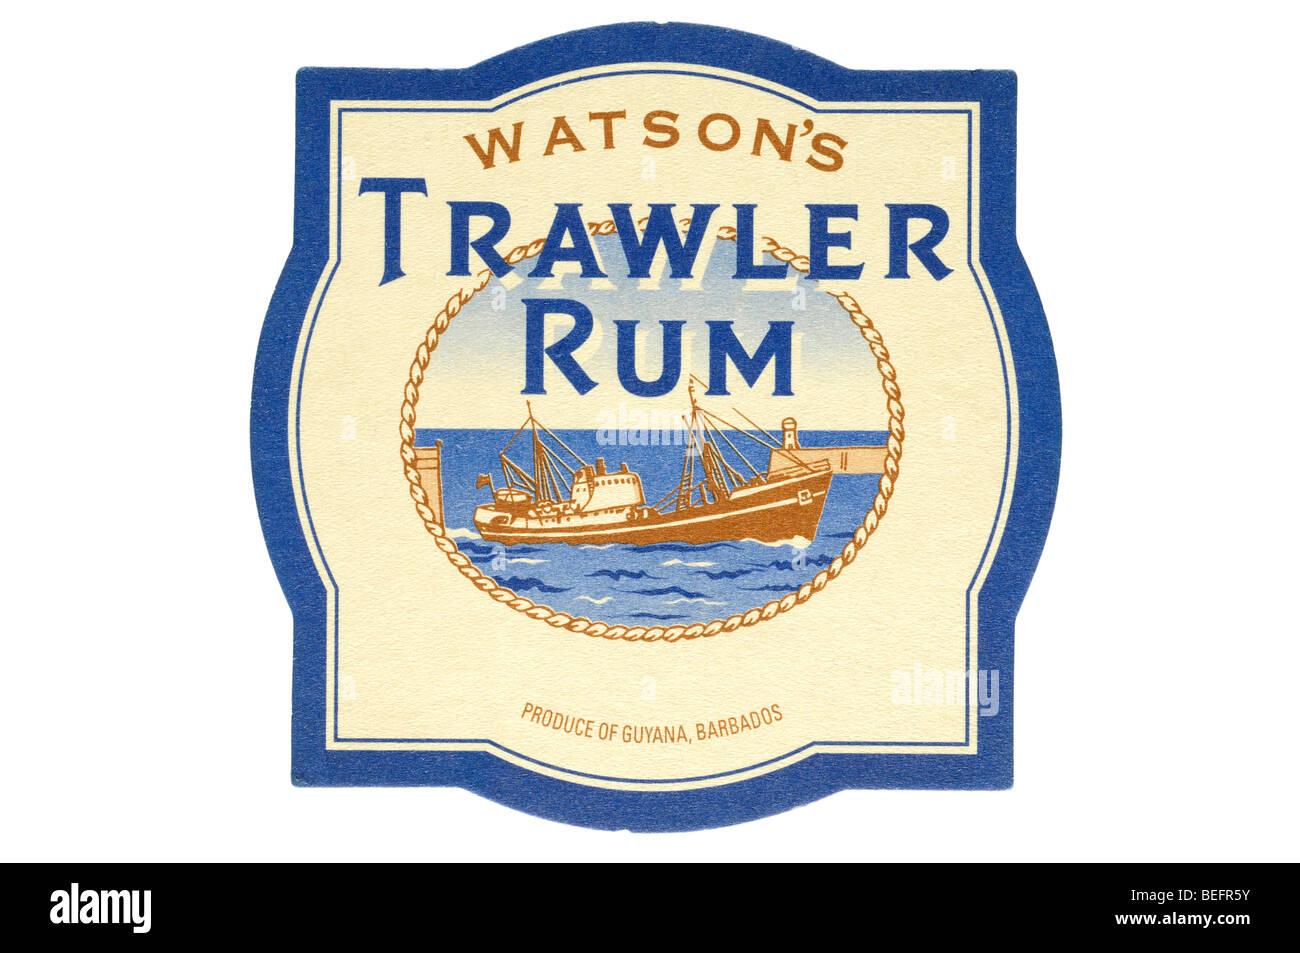 watsons trawler rum - Stock Image